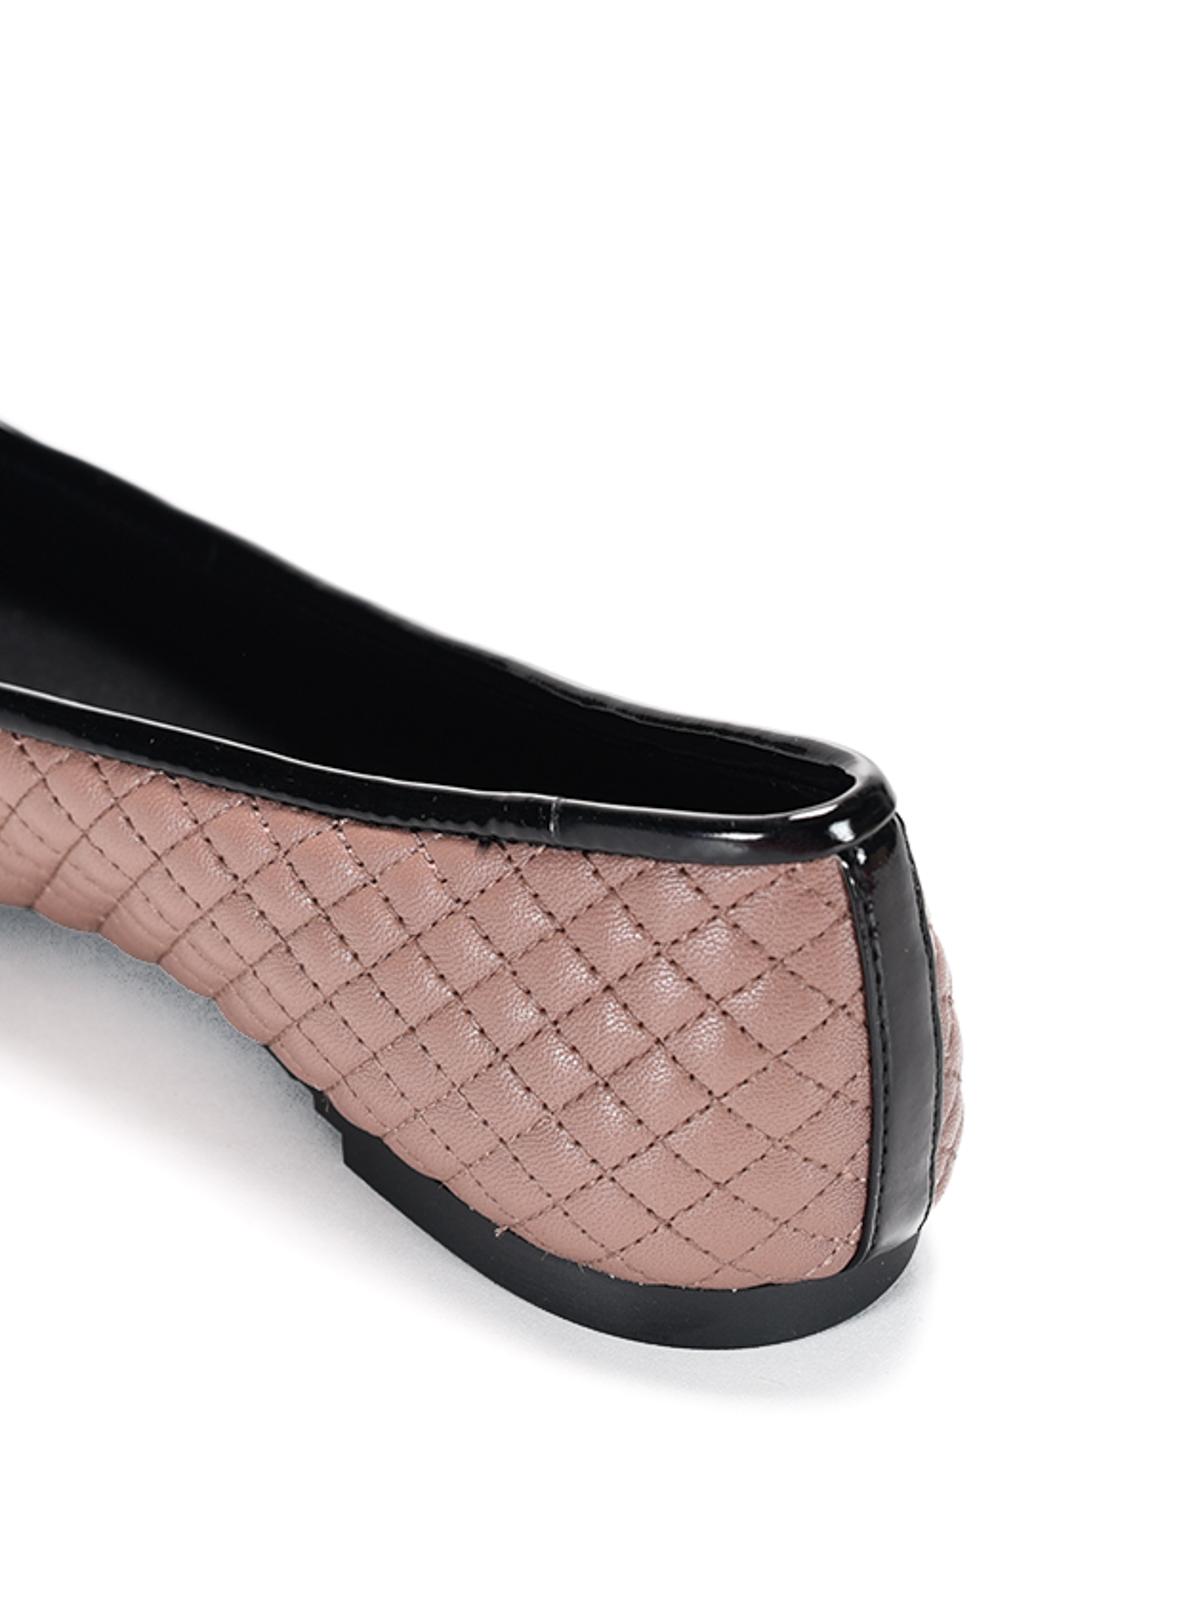 Michael Kors Pink Flat Shoes